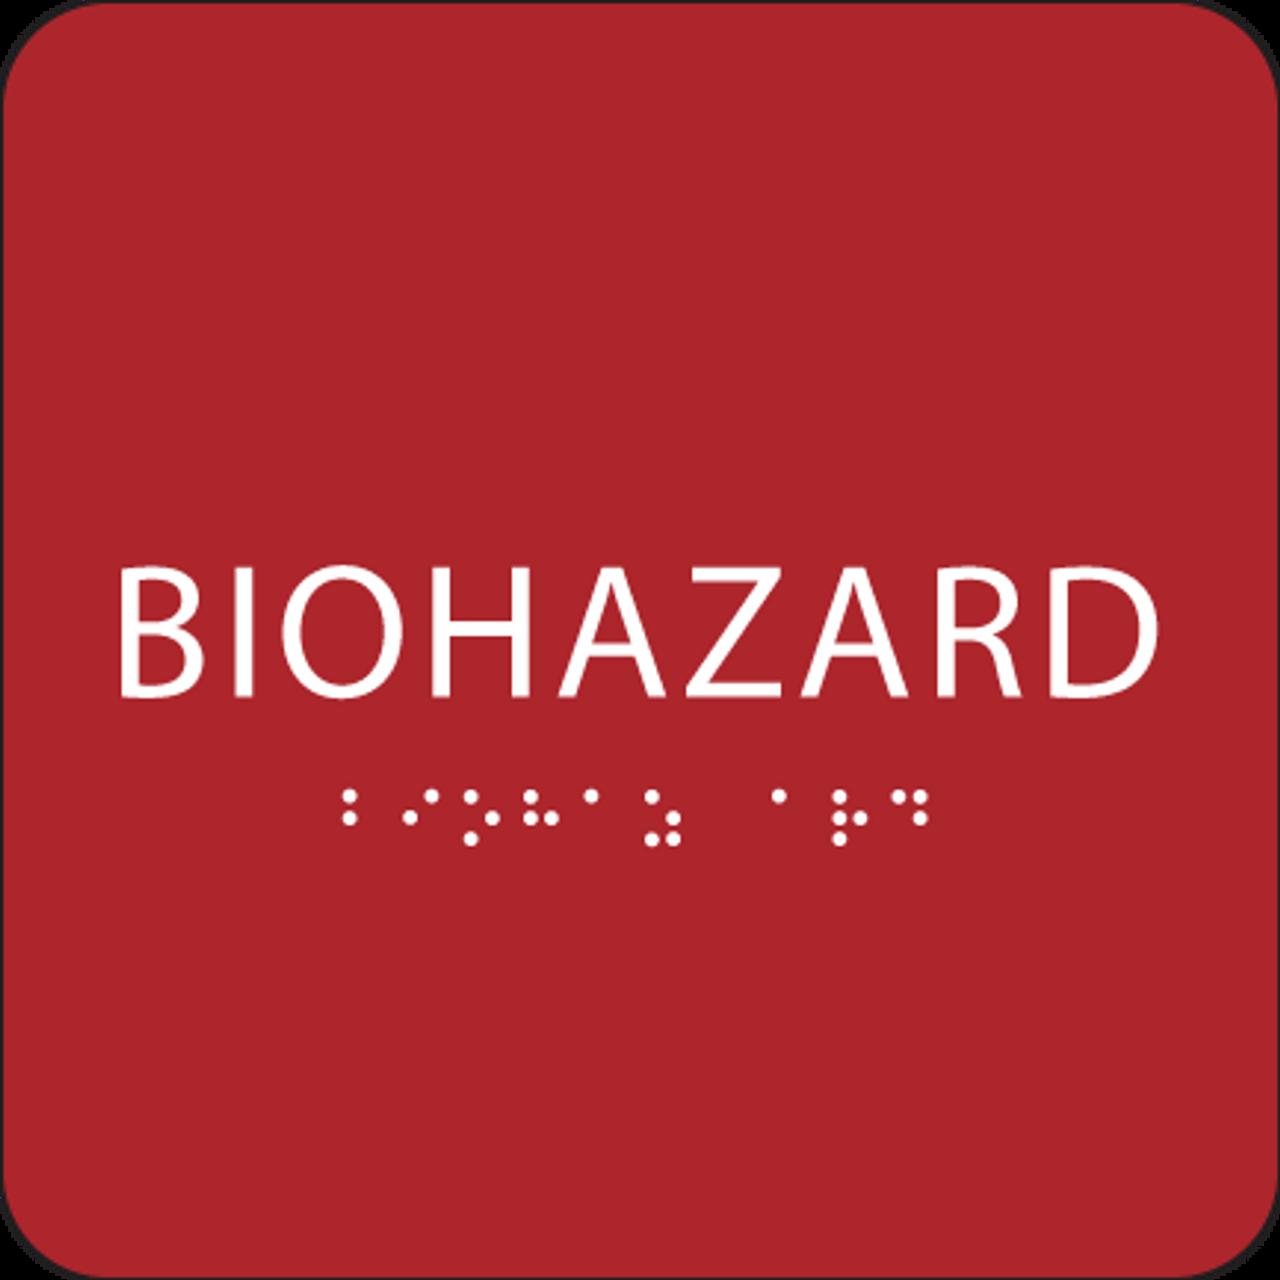 Red Biohazard ADA Sign